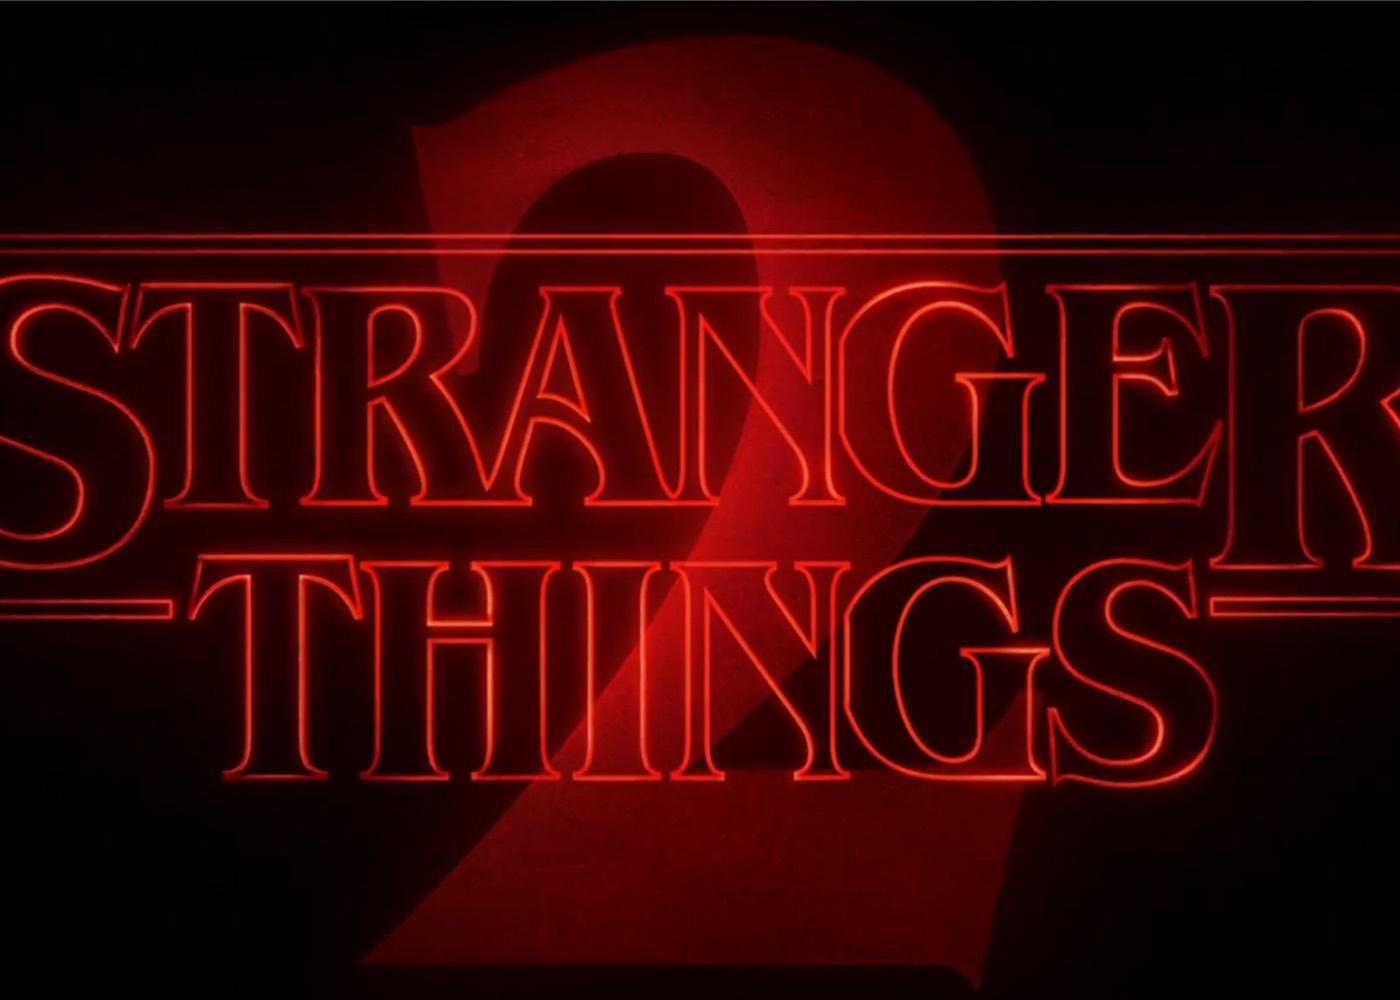 Stranger Things Season 2 Gets a New Teaser & Release Date